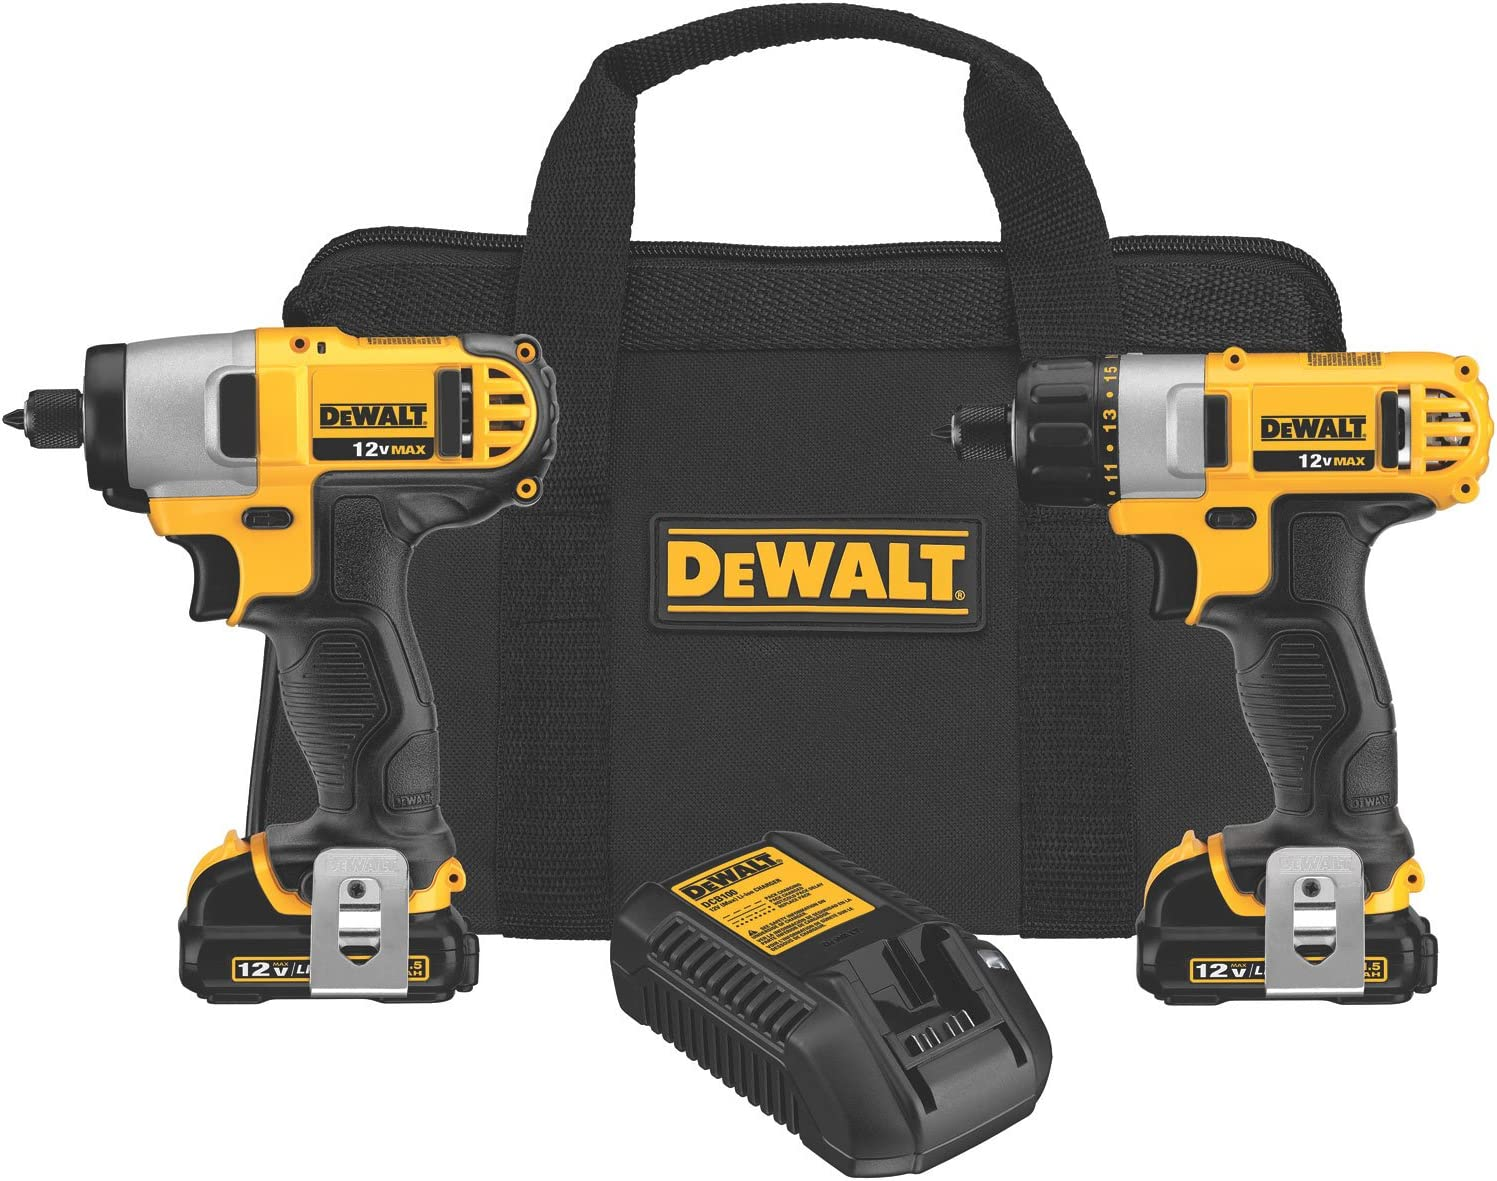 DEWALT SEAL限定商品 12V Cordless ギフ_包装 Screwdriver Impact DCK21 Combo Driver Kit